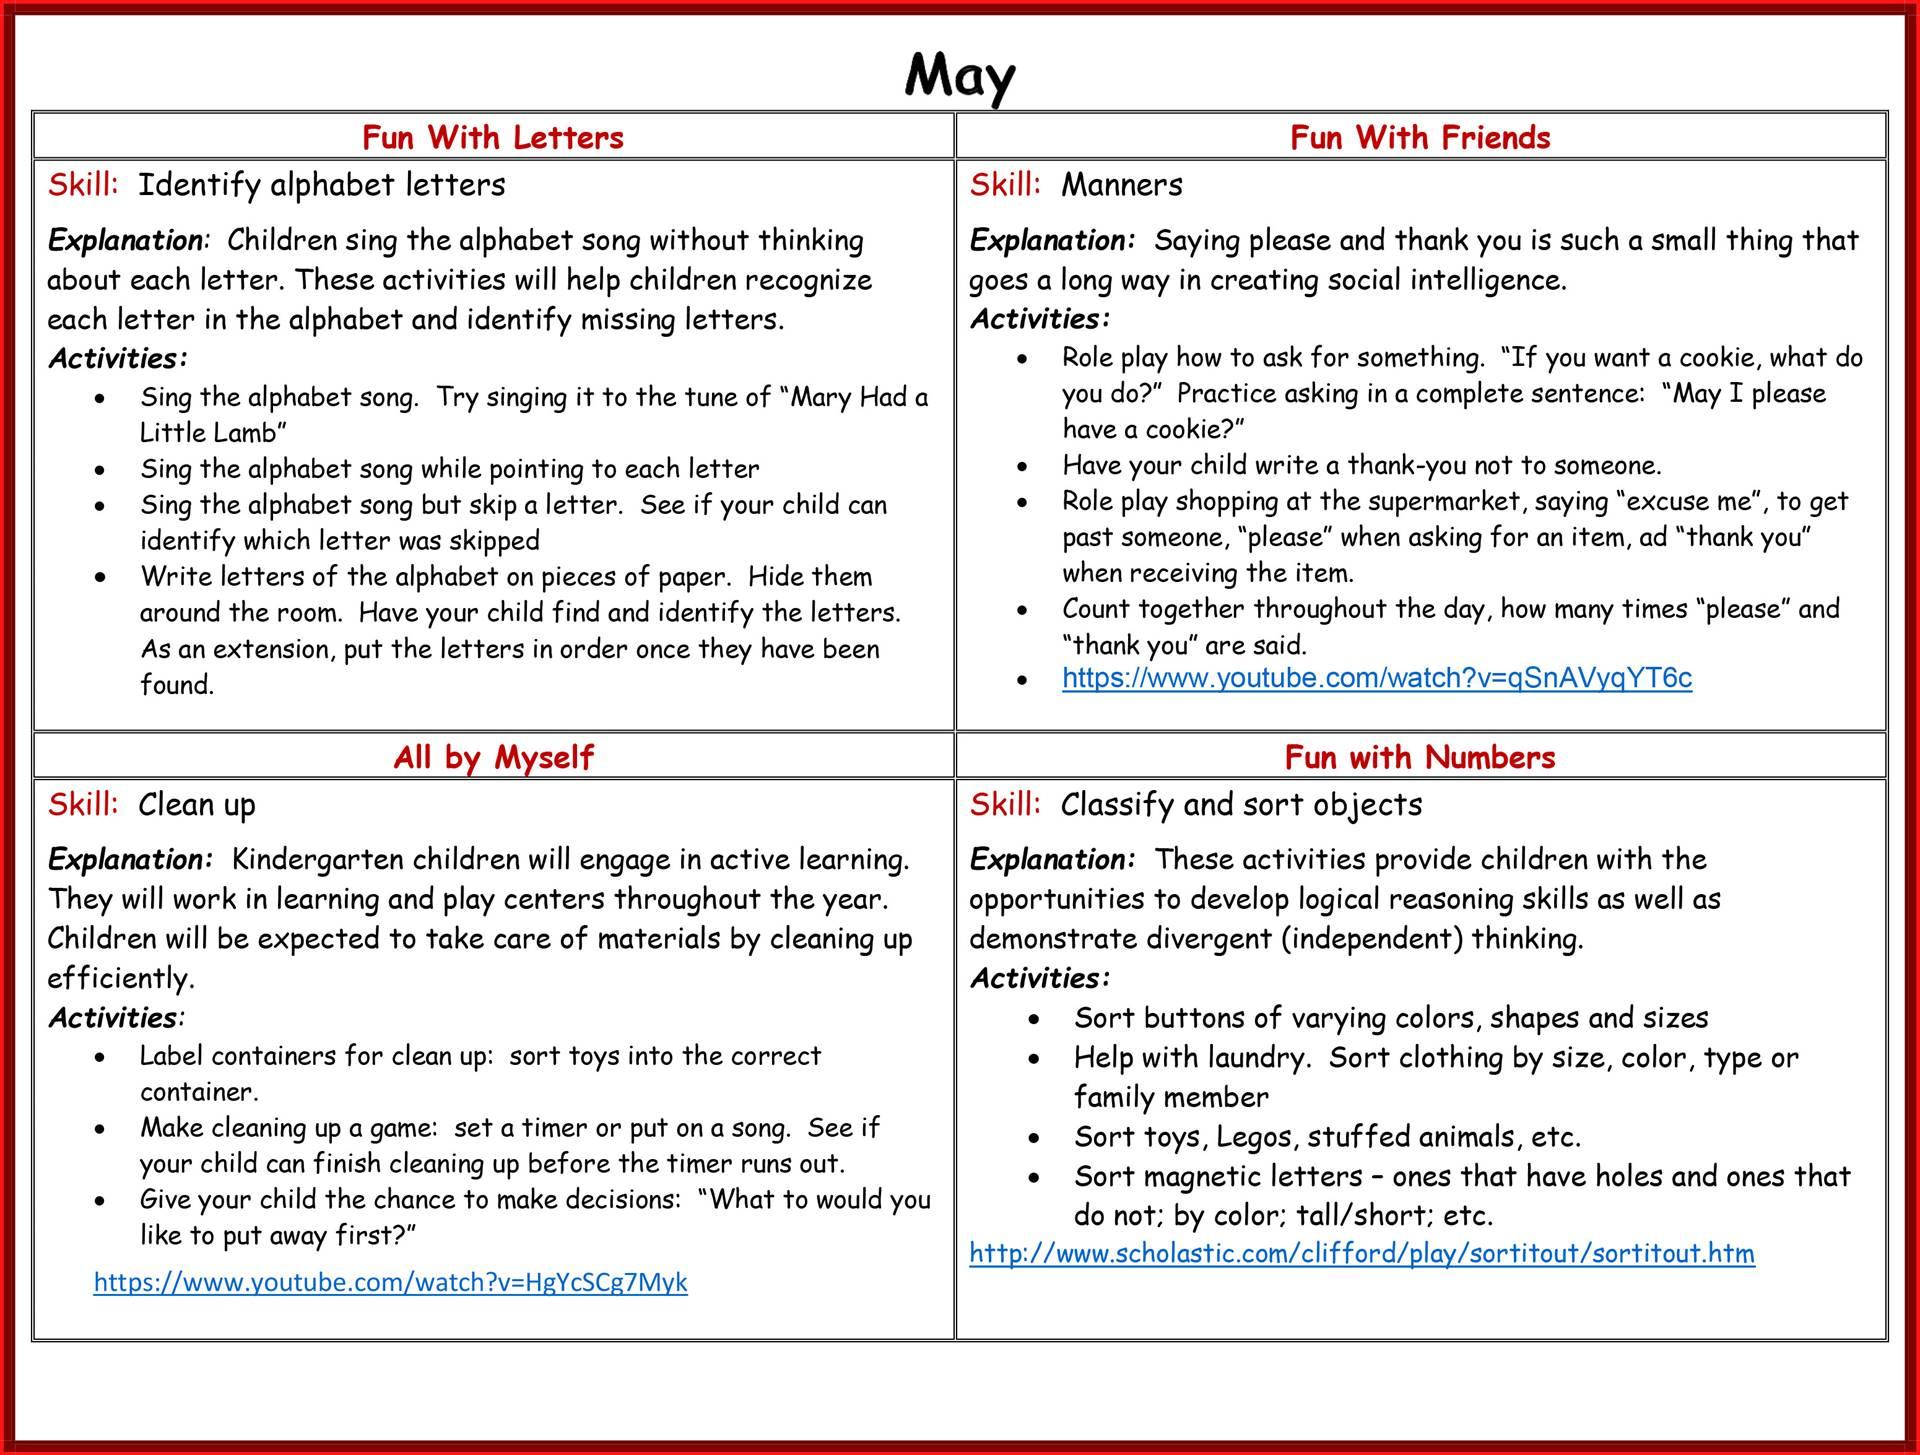 Kindergarten Readiness Calendar - May page 2